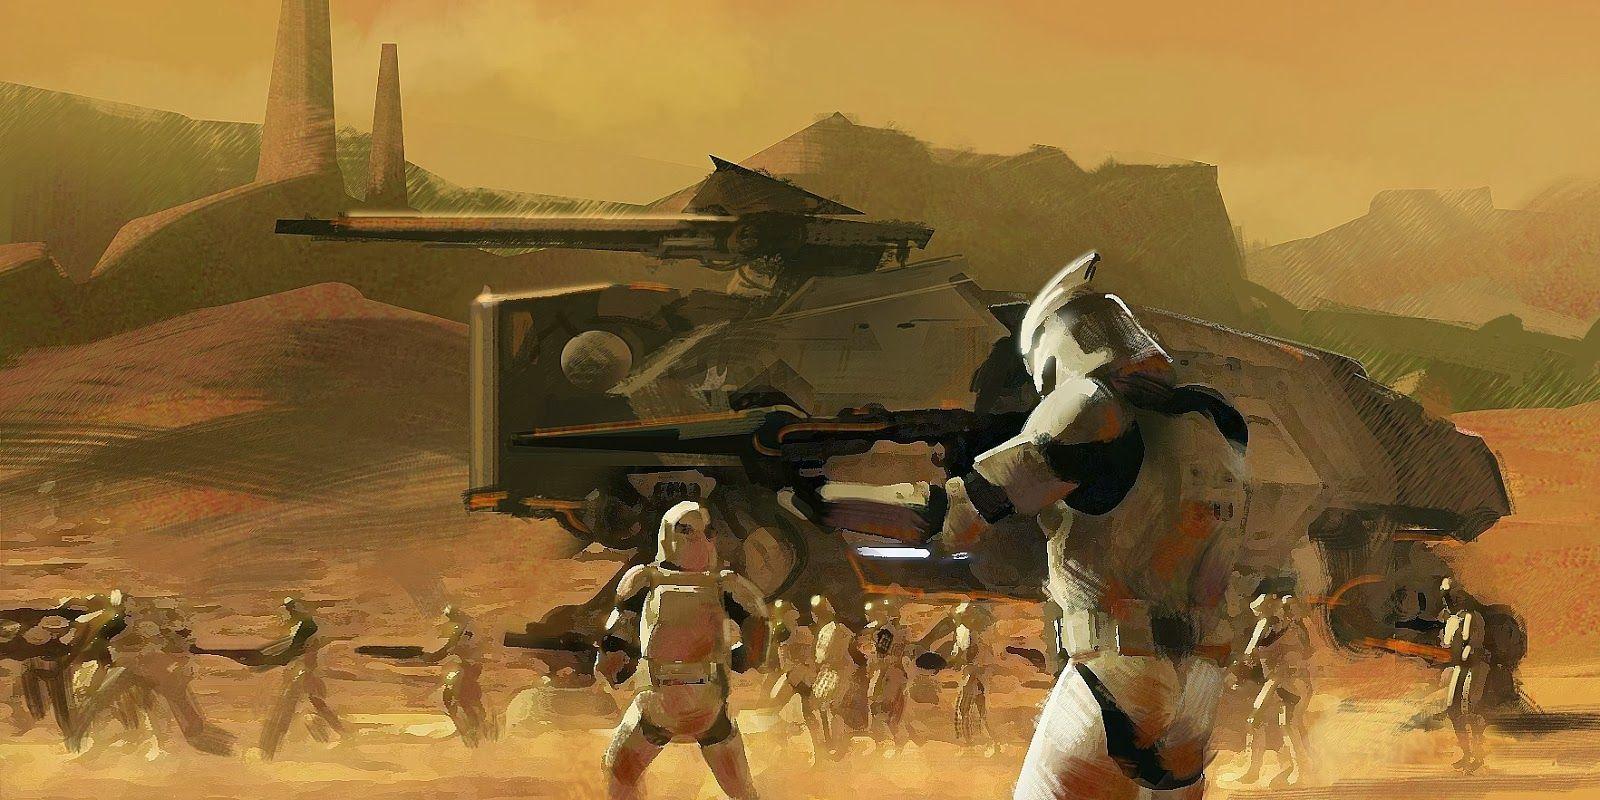 Battle Of Geonosis Star Wars Background Star Wars History Star Wars Images